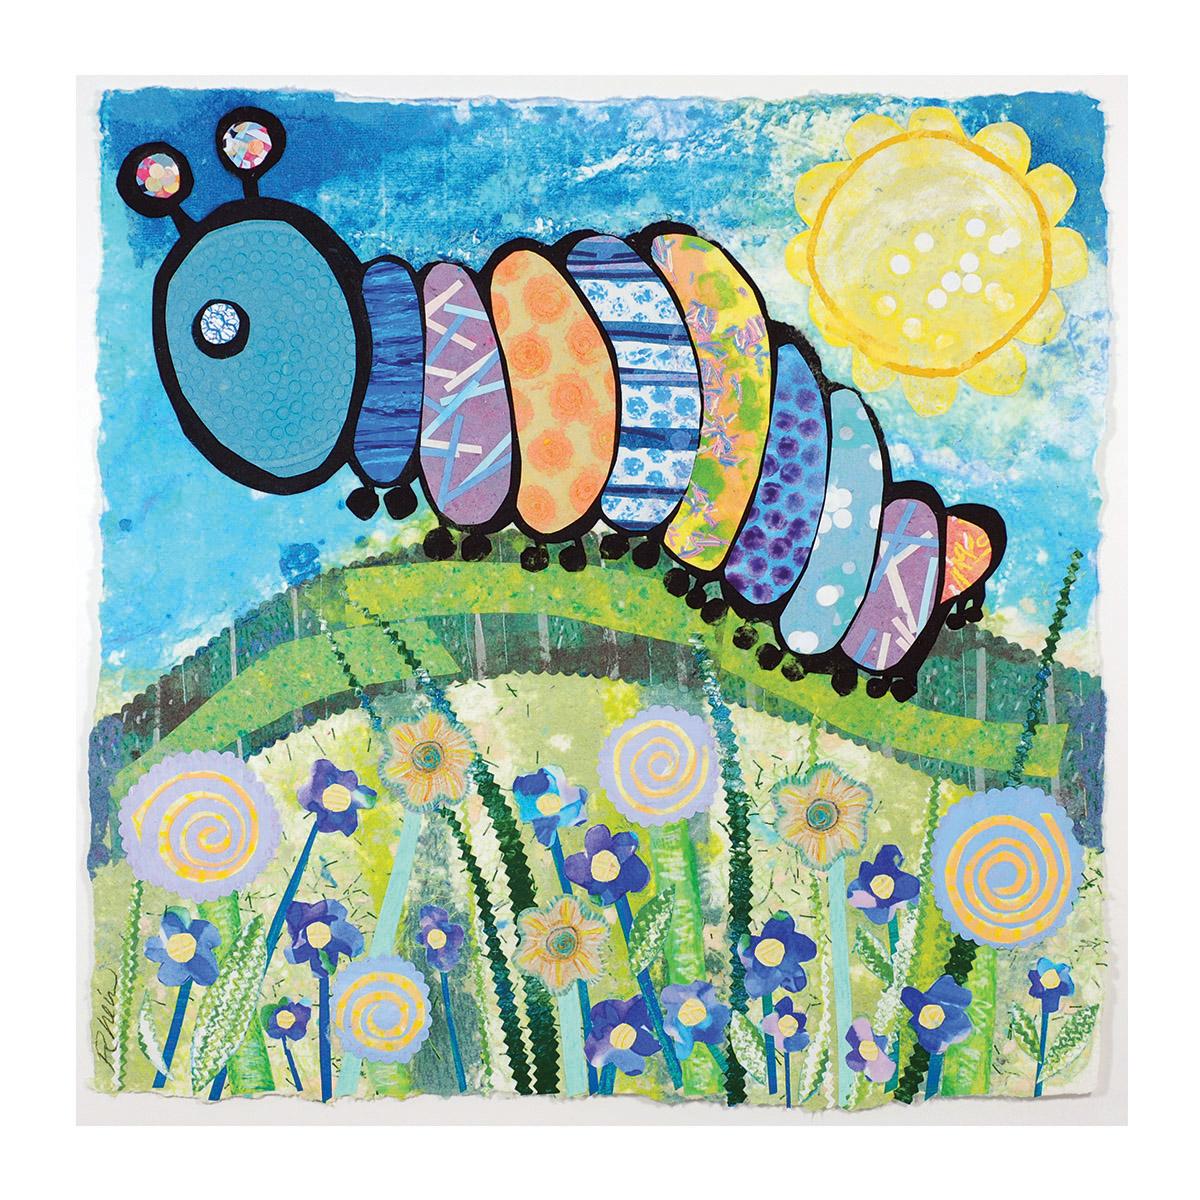 Caterpillar's Coat of Many Colors - 1